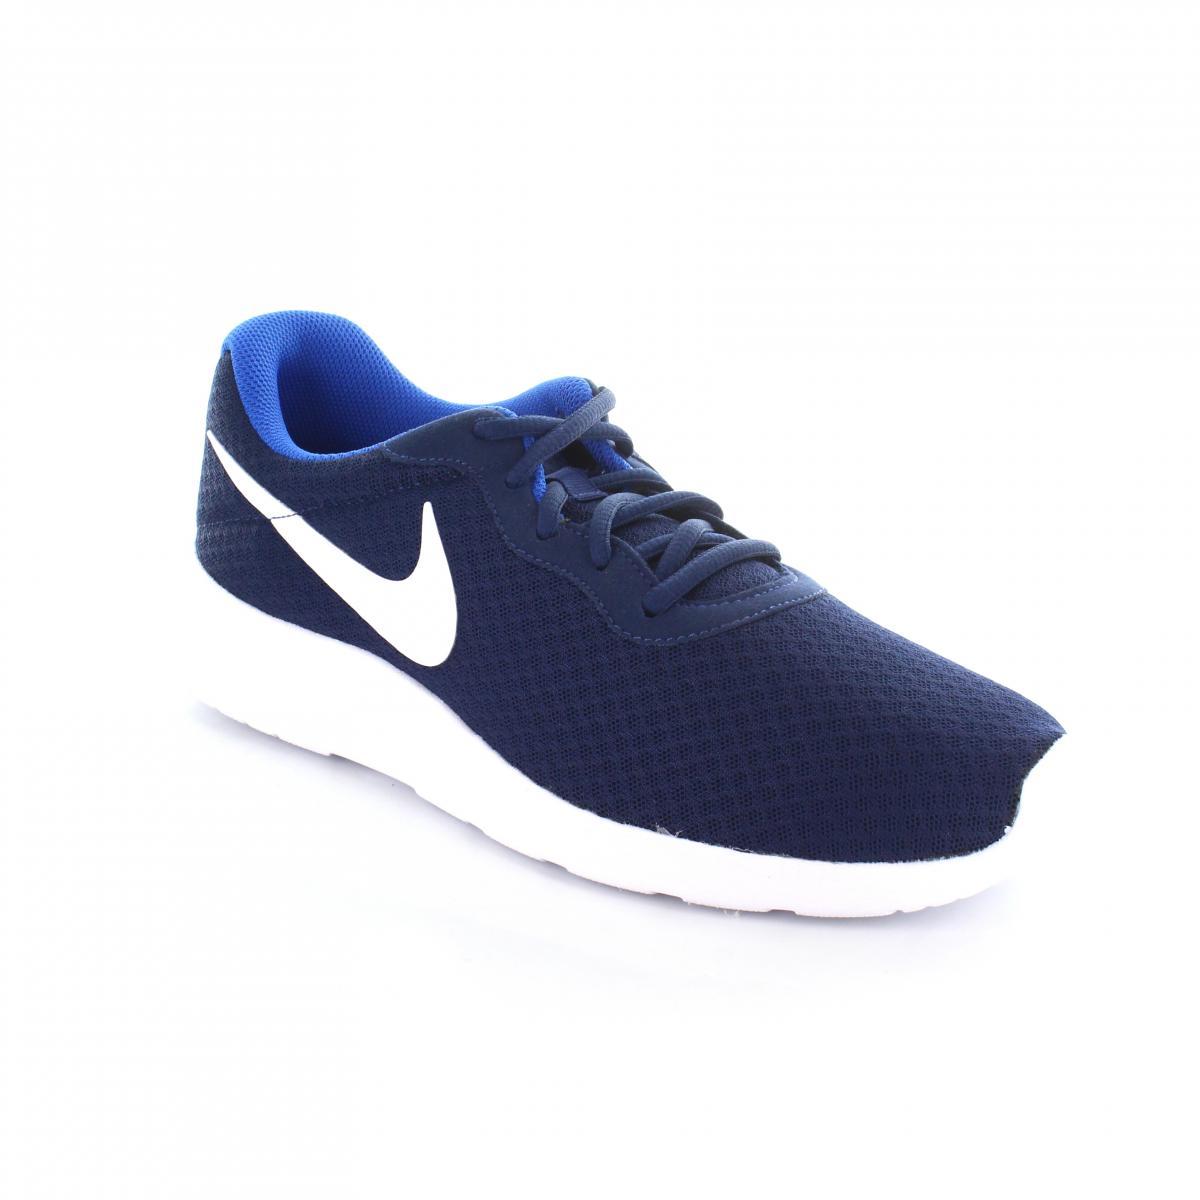 306a7d9f Tenis marca Nike modelo 812654-414 Color Azul/blanco